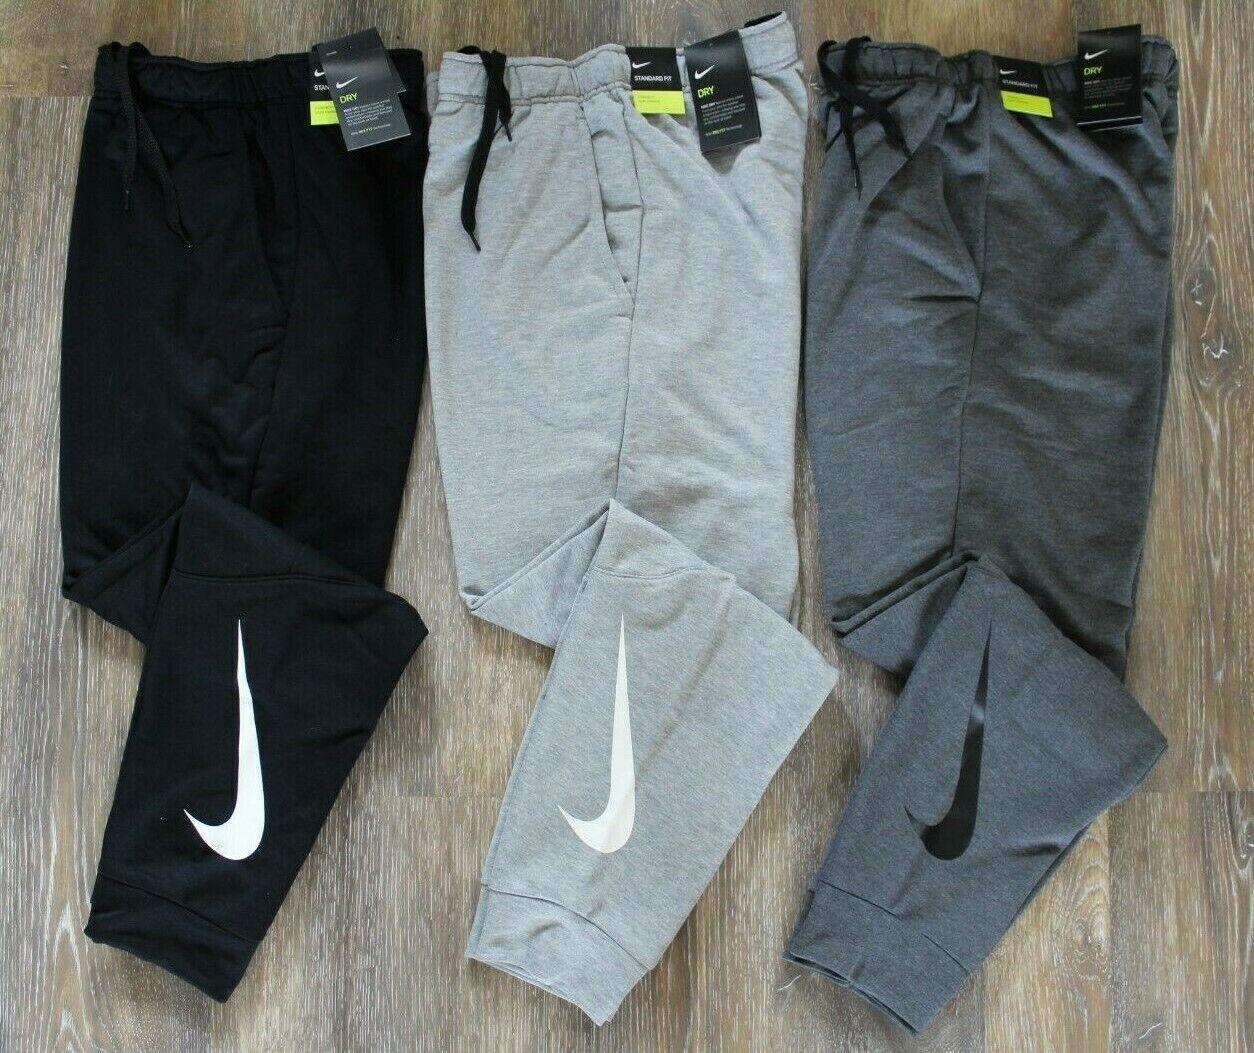 NWT NIKE Men's Dri-Fit Fleece SWOOSH Jogger Sweatpants Gray Black S M L XL XXL